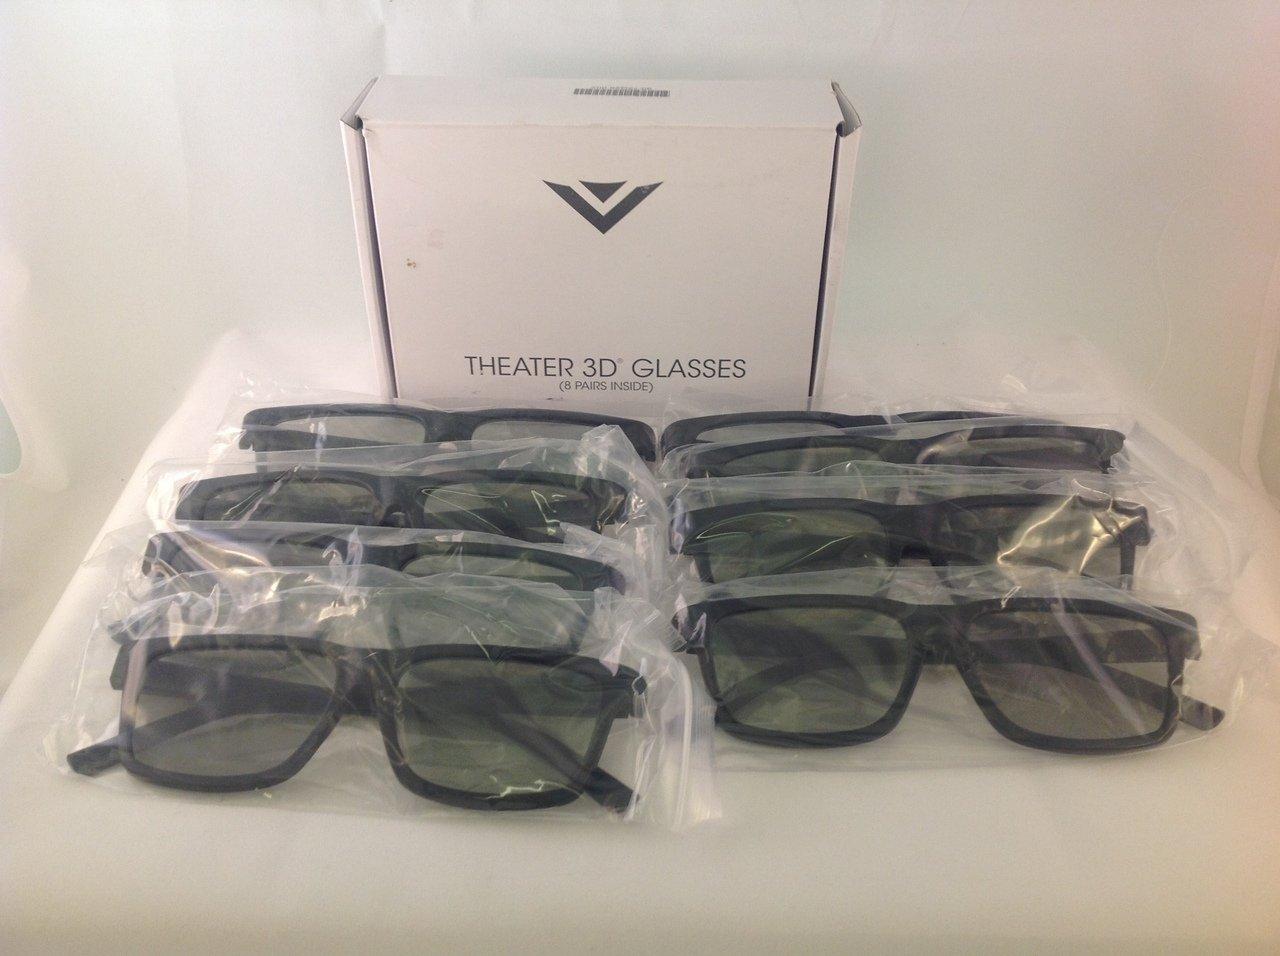 8 Pair of NEW Vizio Passive 3D Glasses XPG308 - Works on All Vizio TV's by VIZIO